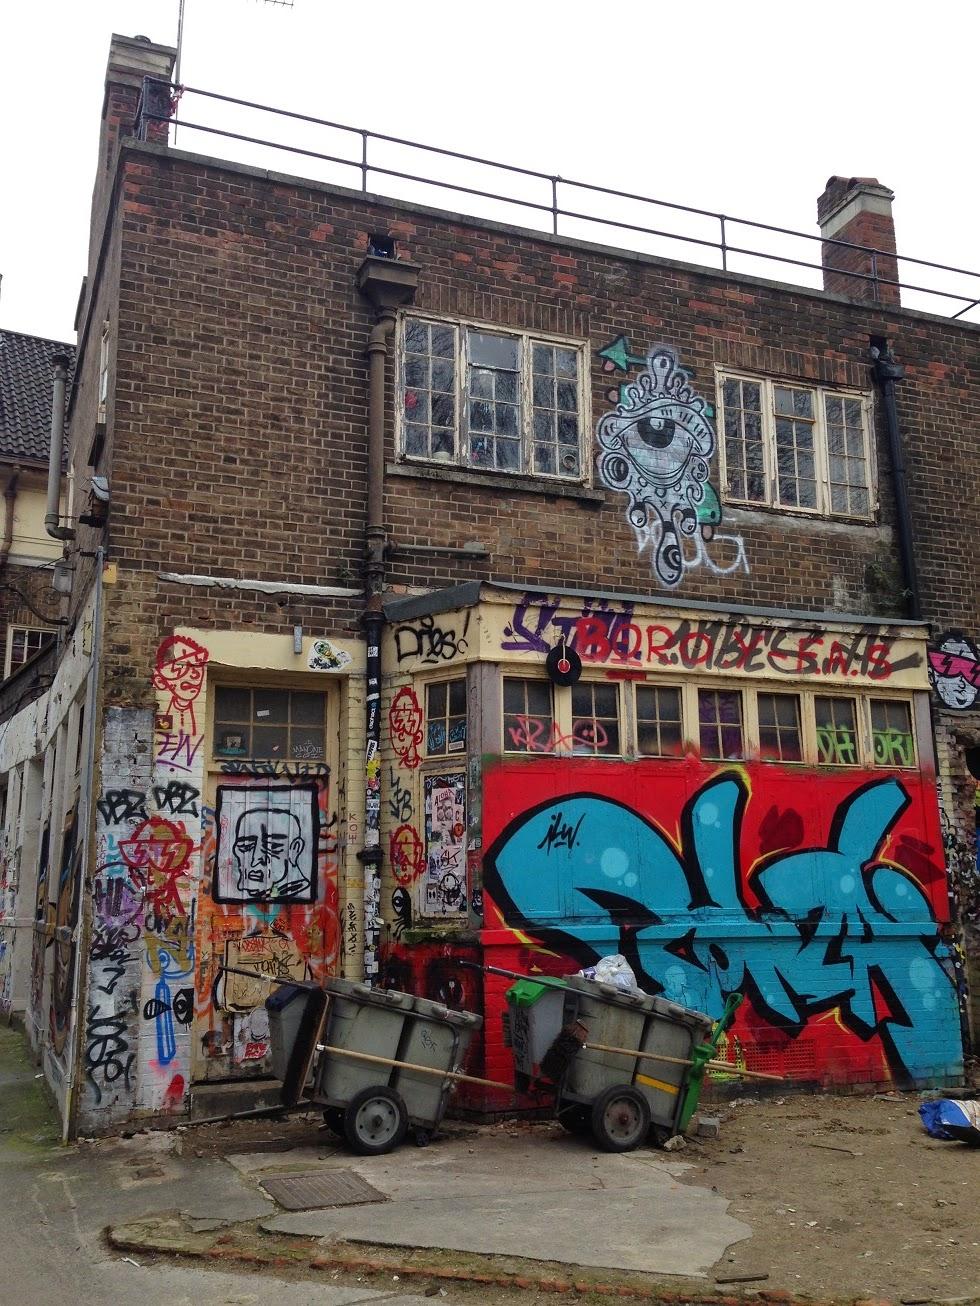 Shoreditch Street Art: Another Return Urban Wander Around Shoreditch, London